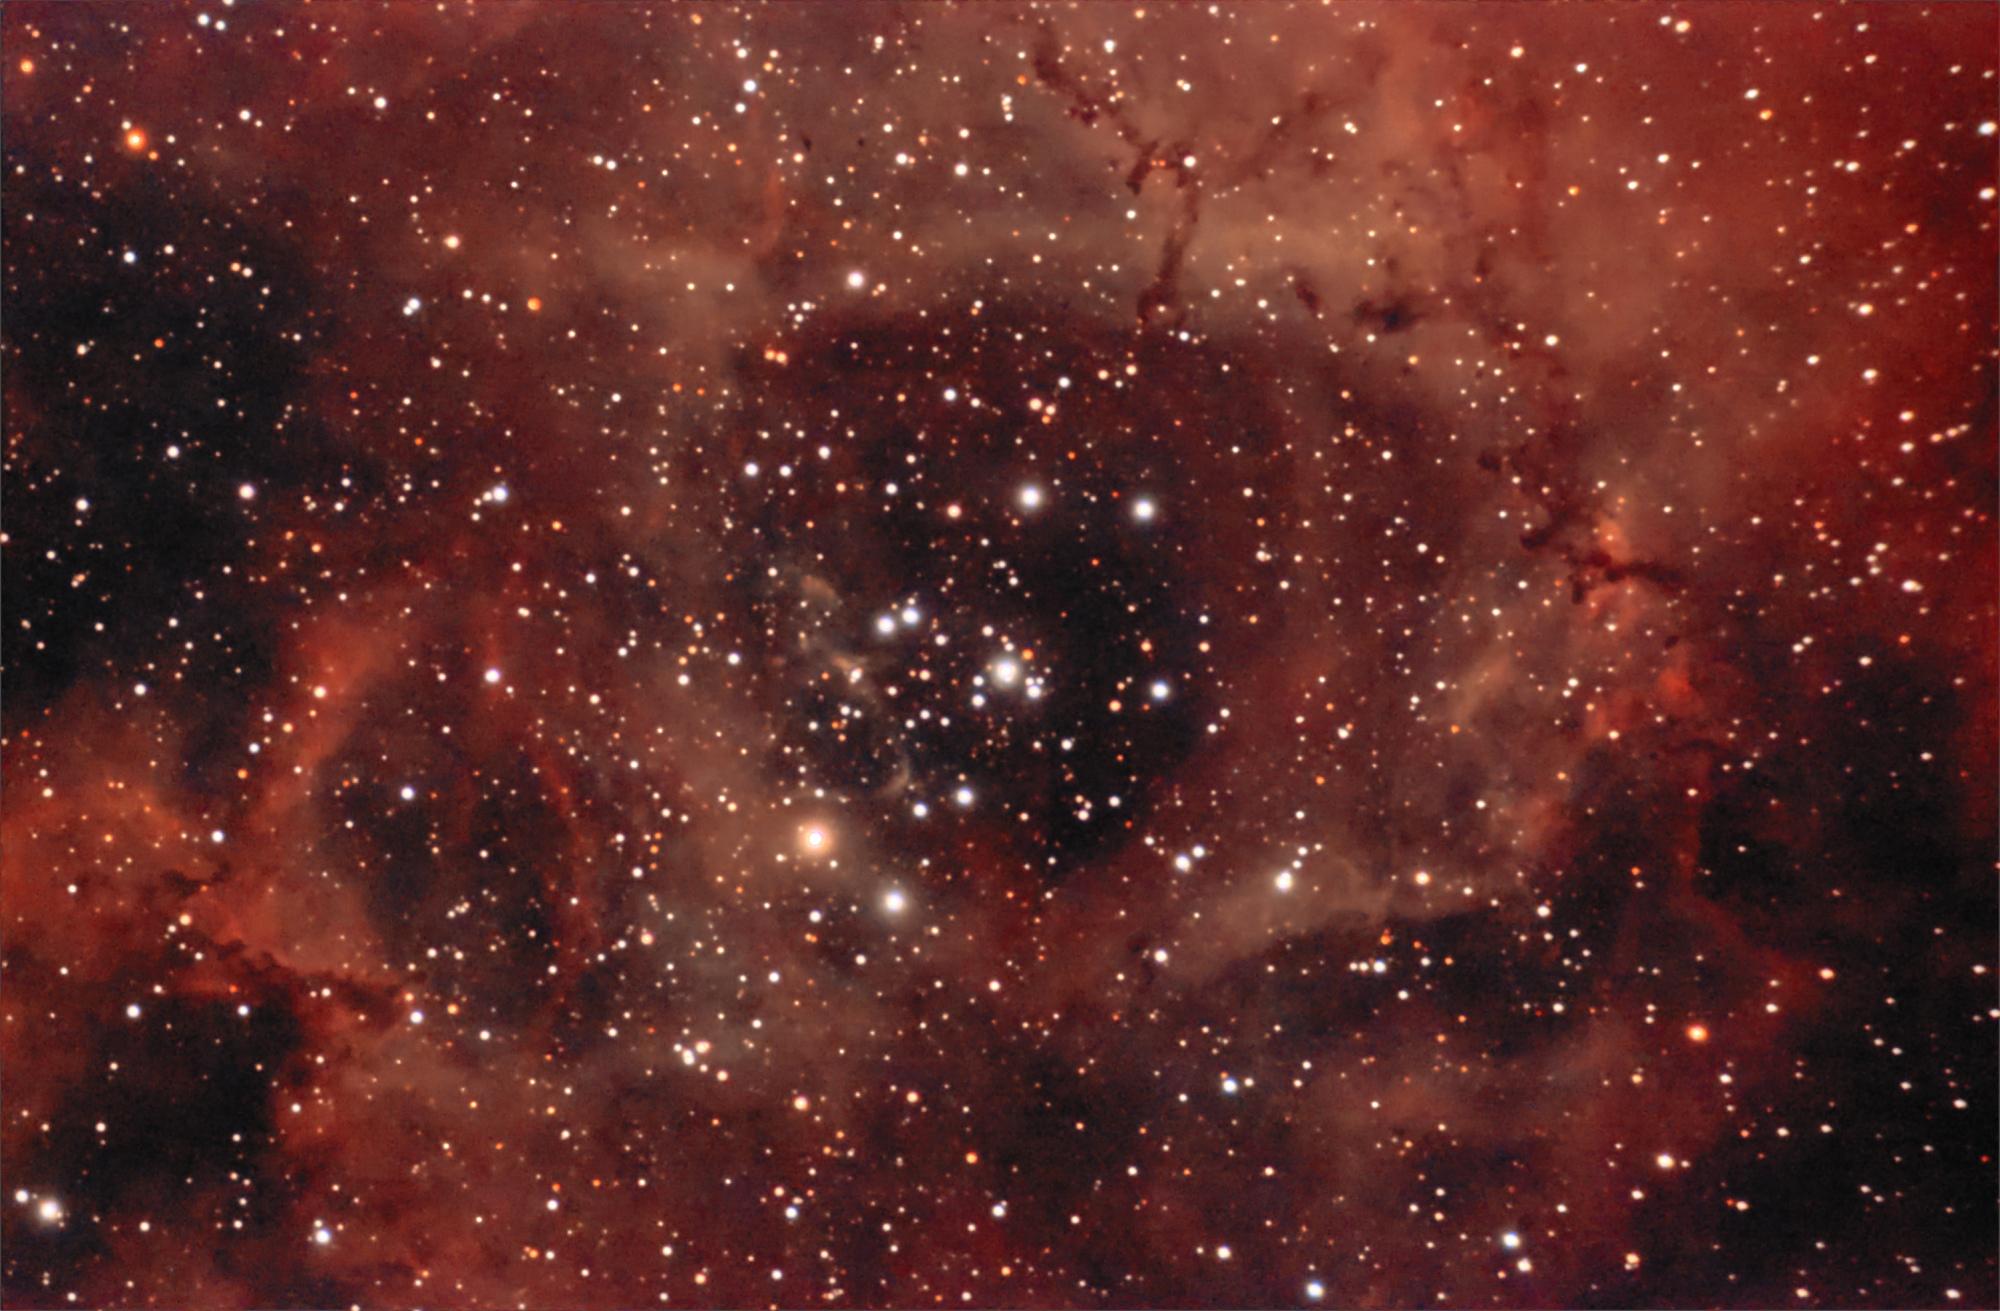 NGC2237-Rosette_2nights_DSS_Siril_AP.jpg